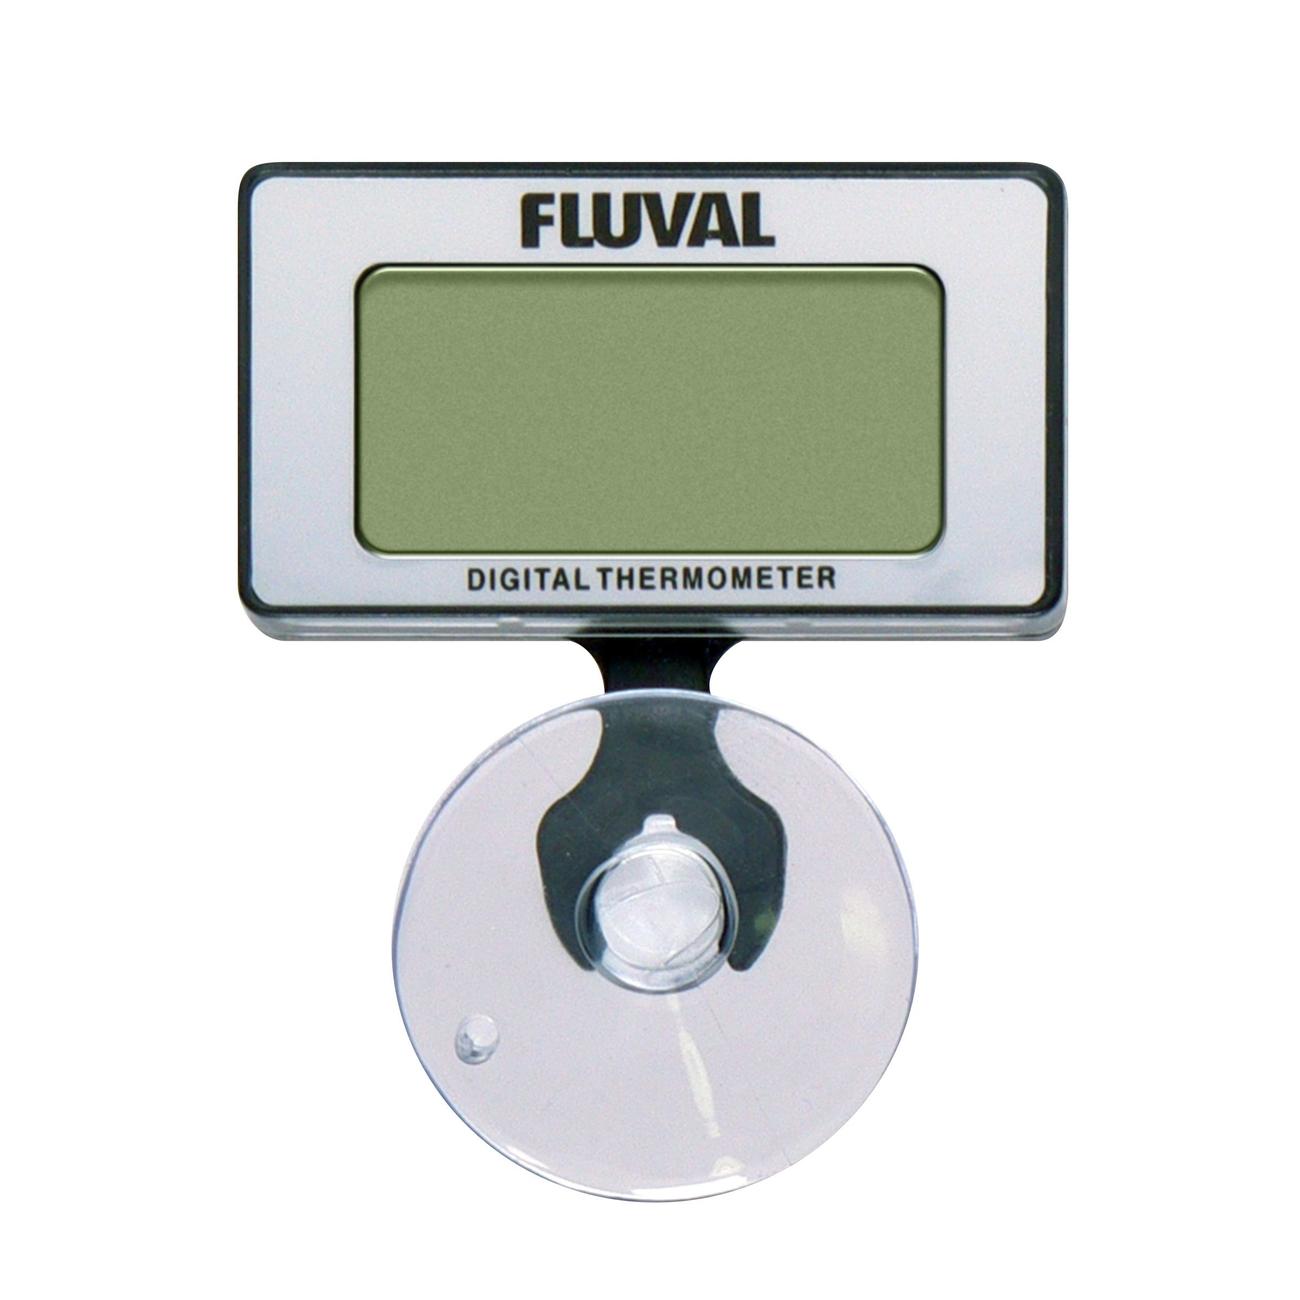 Hagen Fluval tauchbares Digitalthermometer, 4,9 x 2,4 x 6,2 cm